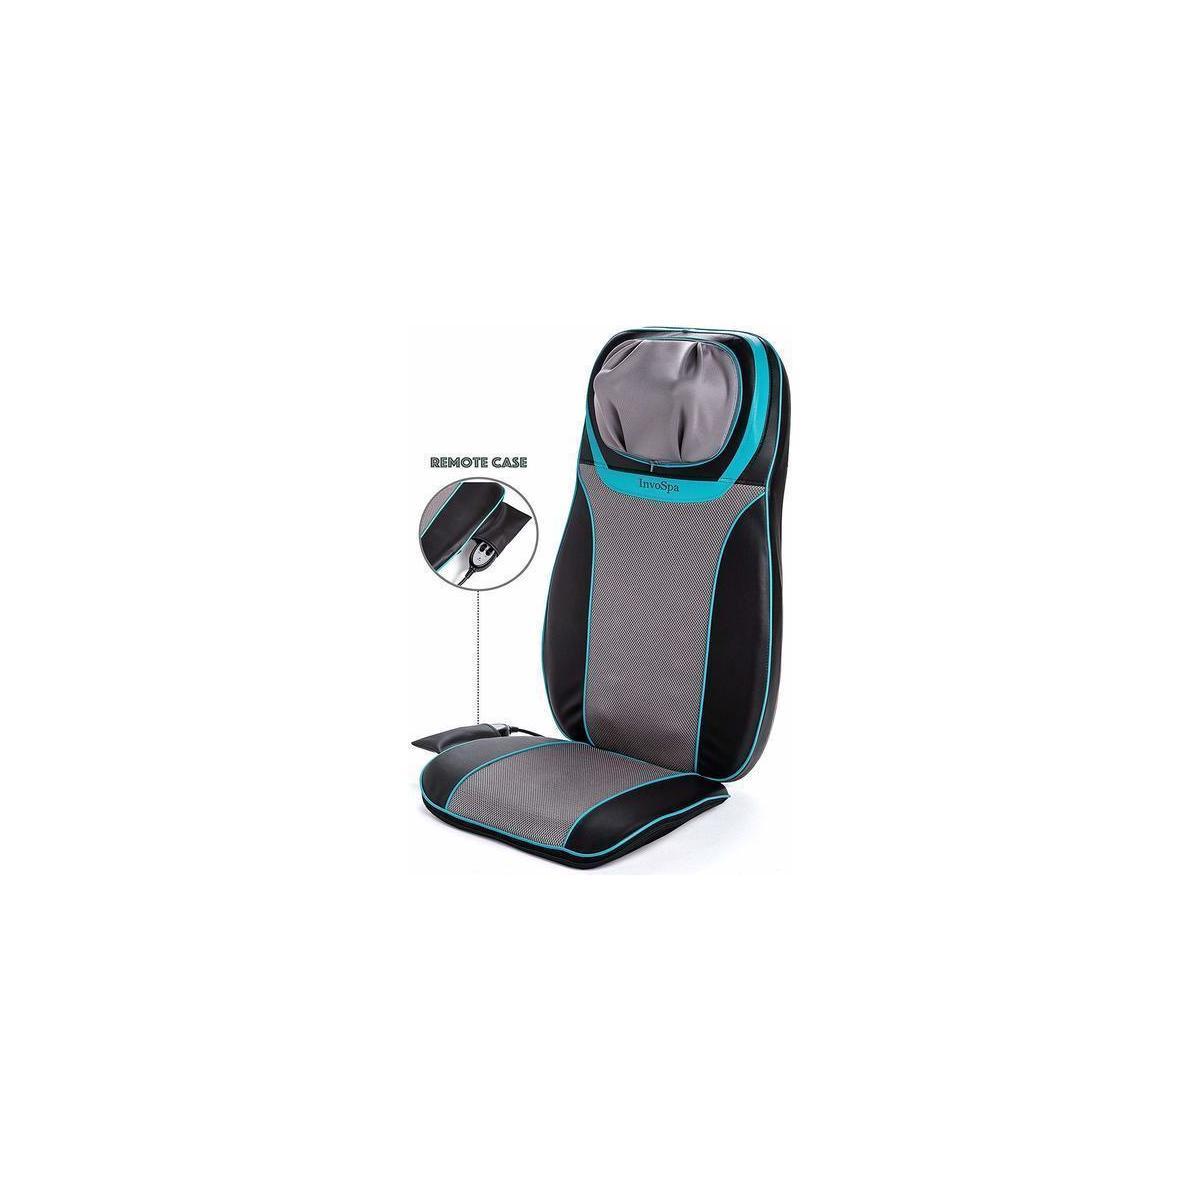 Picture of: Shiatsu Back Neck Seat Cushion Massager Chair Massage Pad With Soothing Heat Cashback Rebates Rebatekey